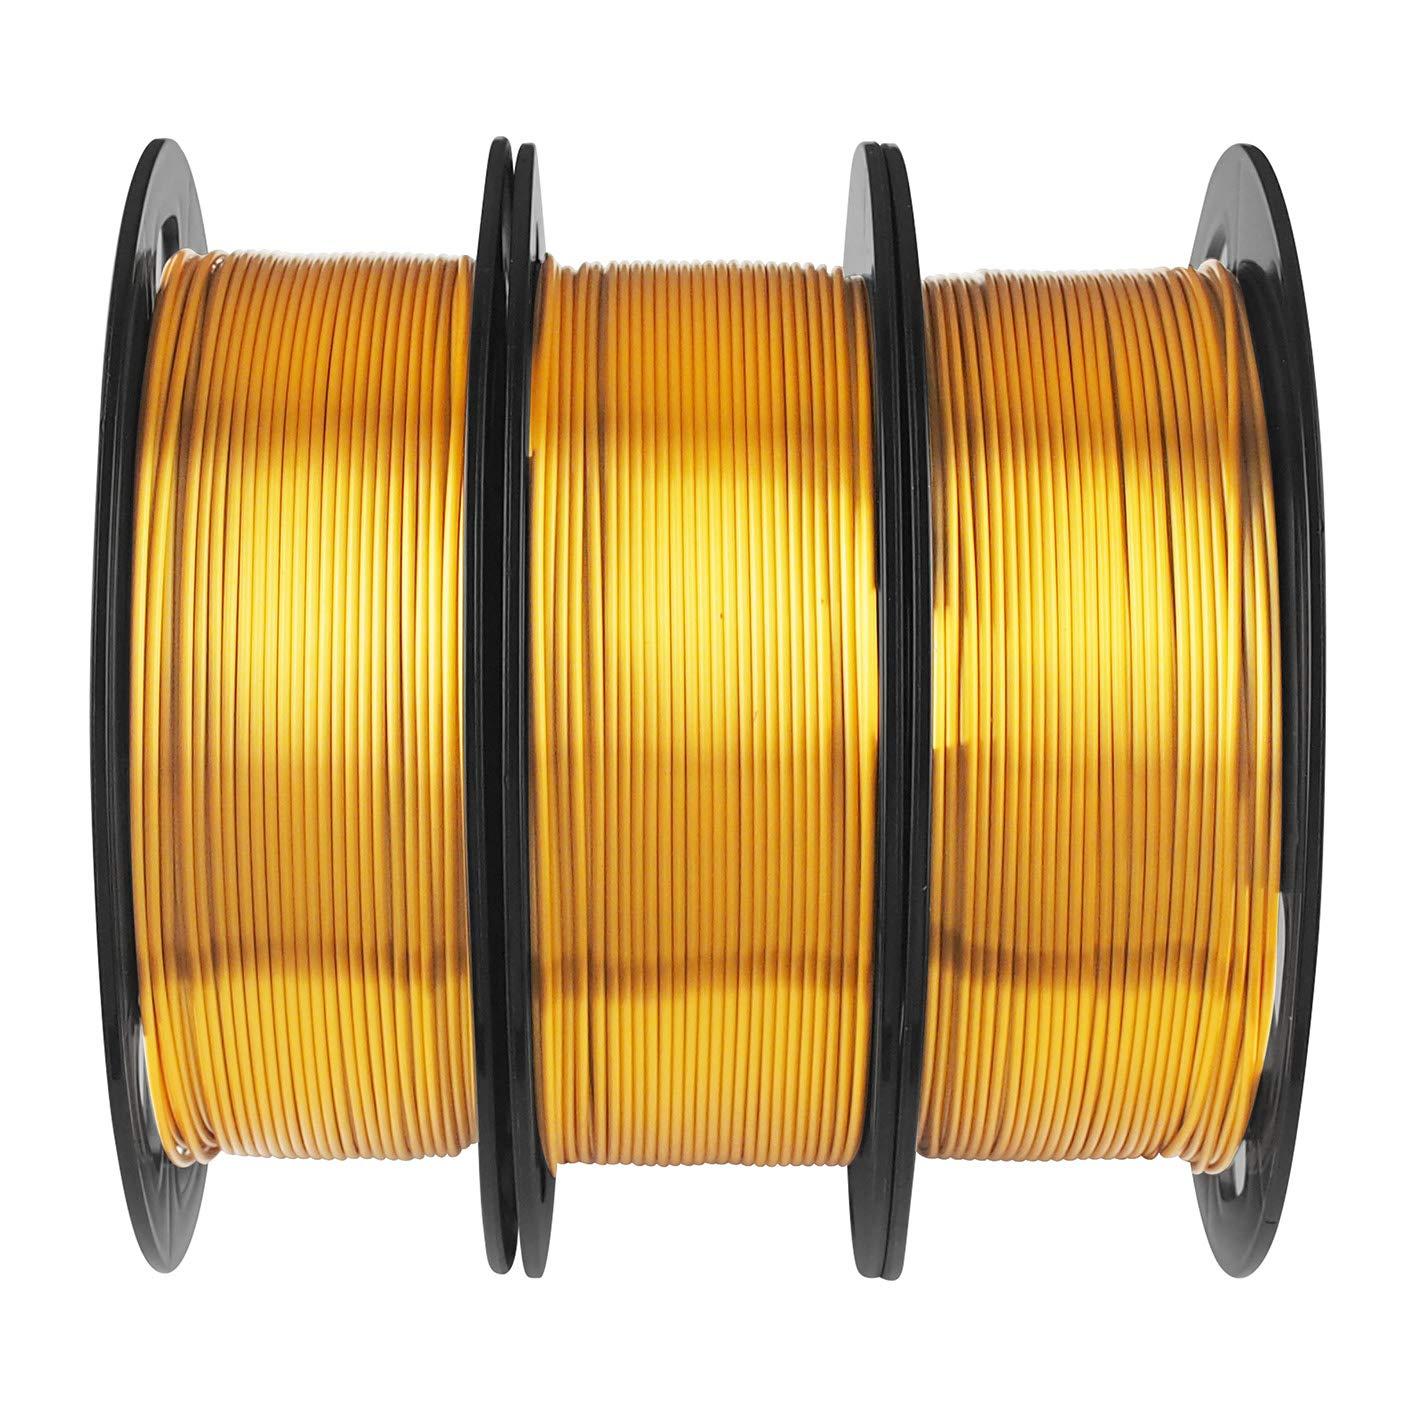 Filamento PLA 1.75mm 0.5kg COLOR FOTO-1 IMP 3D [7TZ1LFPR]